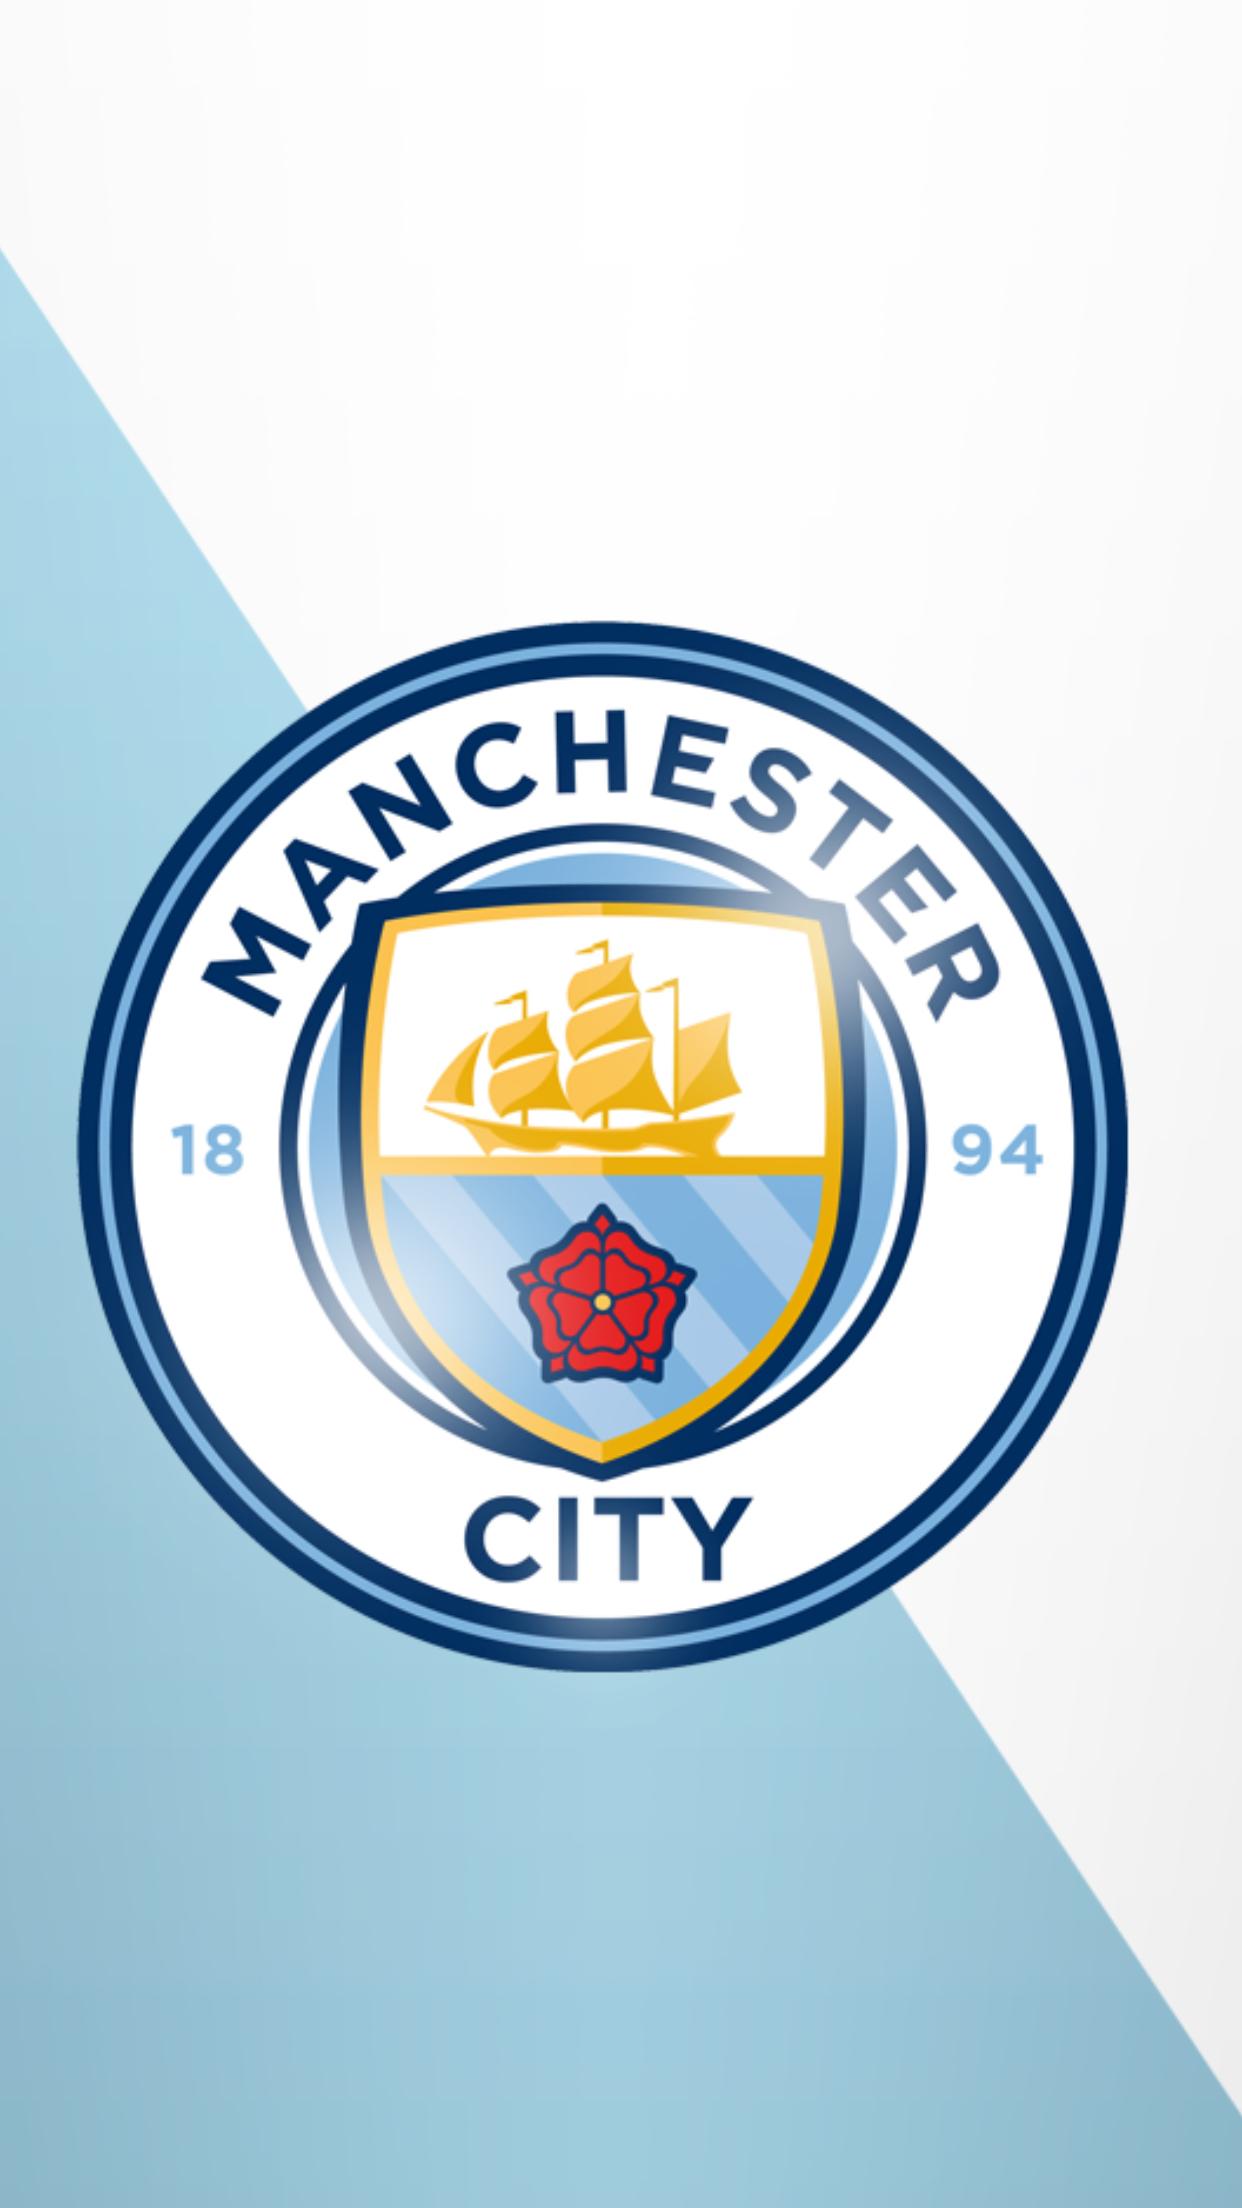 75+ Manchester City Logo Wallpaper on WallpaperSafari